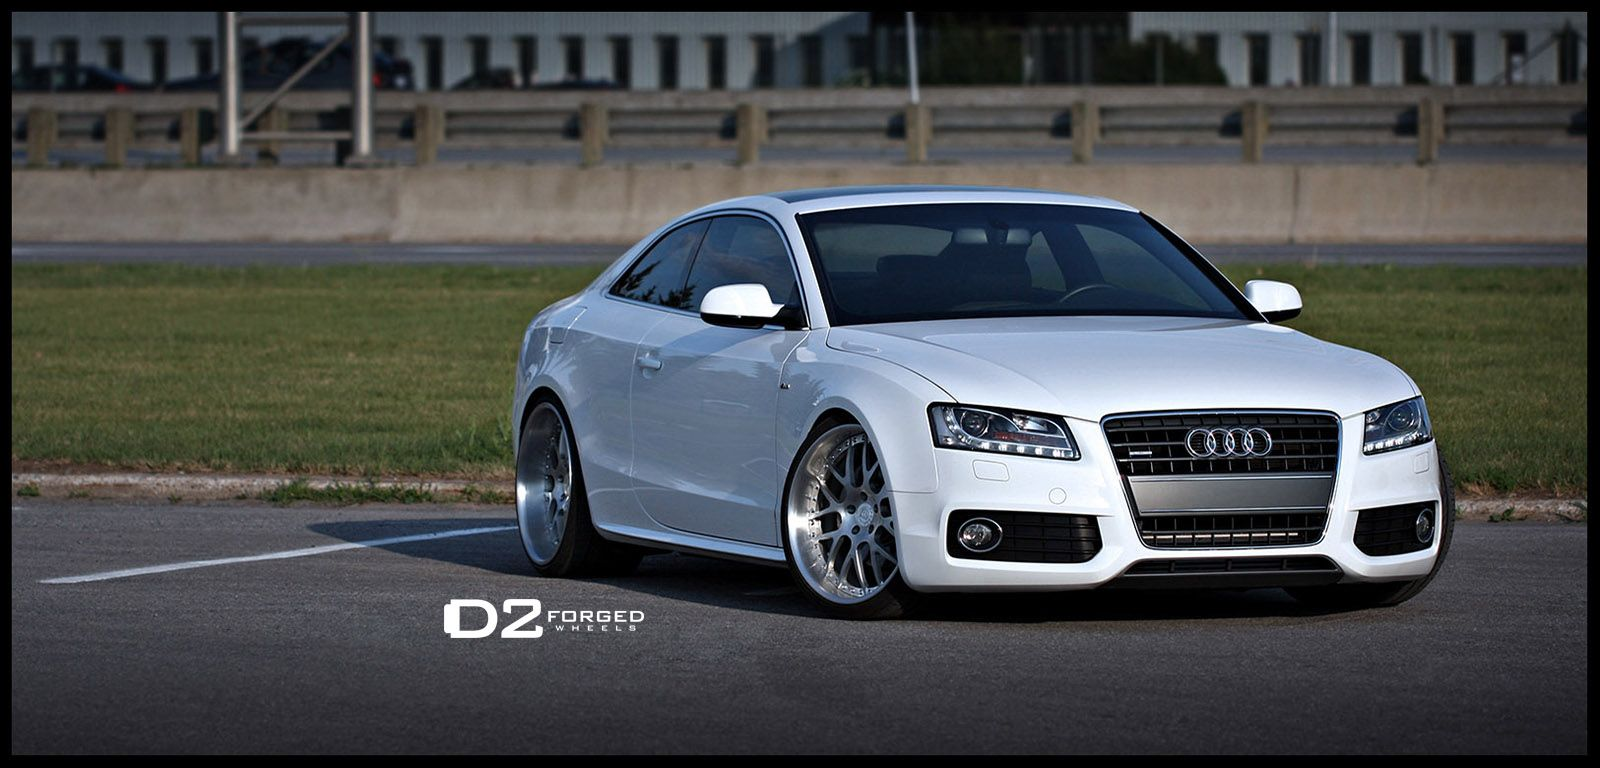 Audi S5 On D2 Forged Fms 01 Wheels Audi A5 Audi S5 Audi